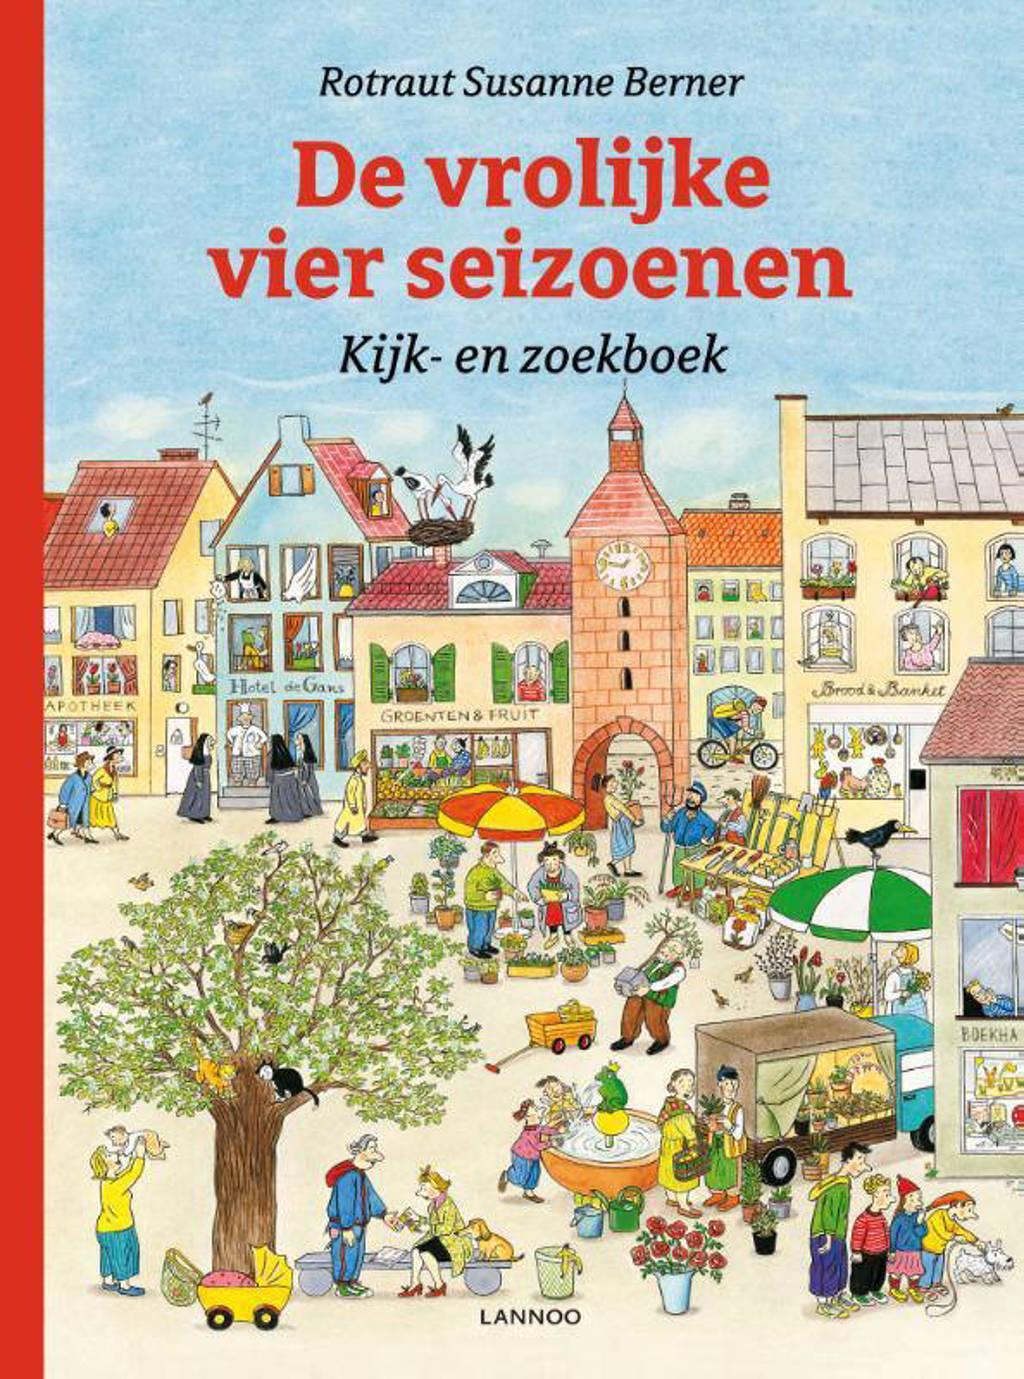 De vrolijke vier seizoenen - Rotraut Susanne Berner